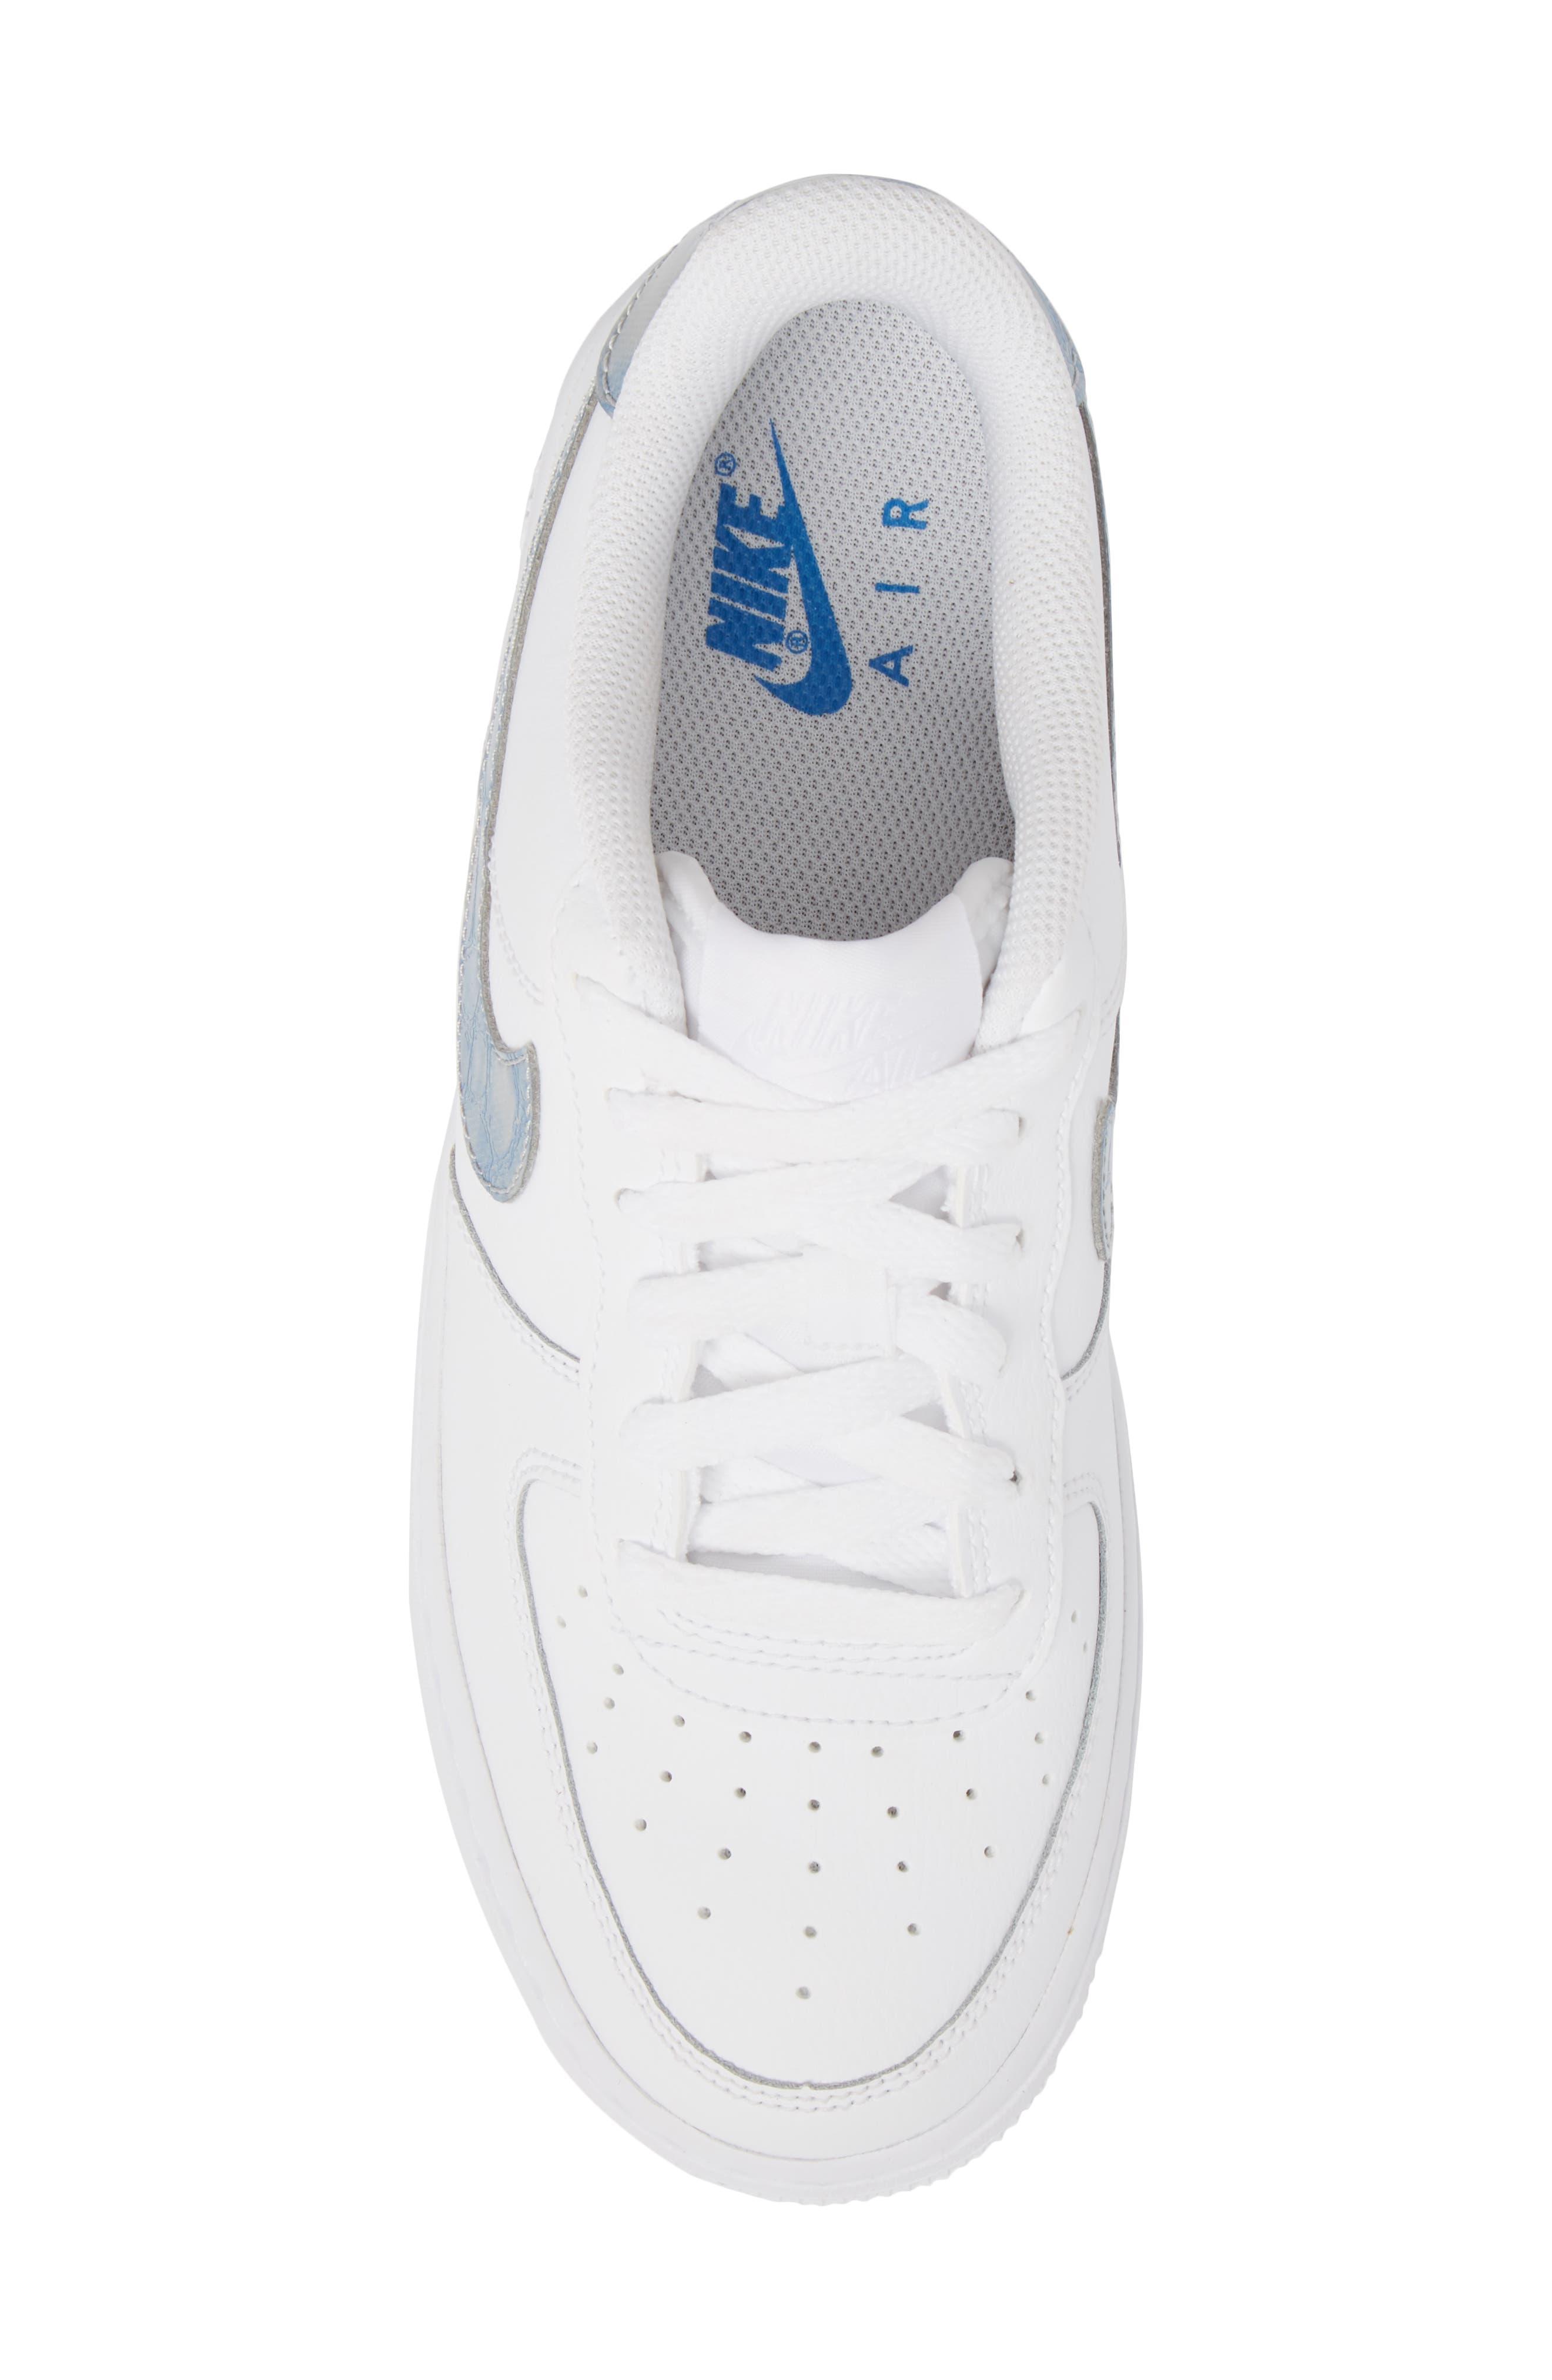 Air Force 1 '06 Sneaker,                             Alternate thumbnail 15, color,